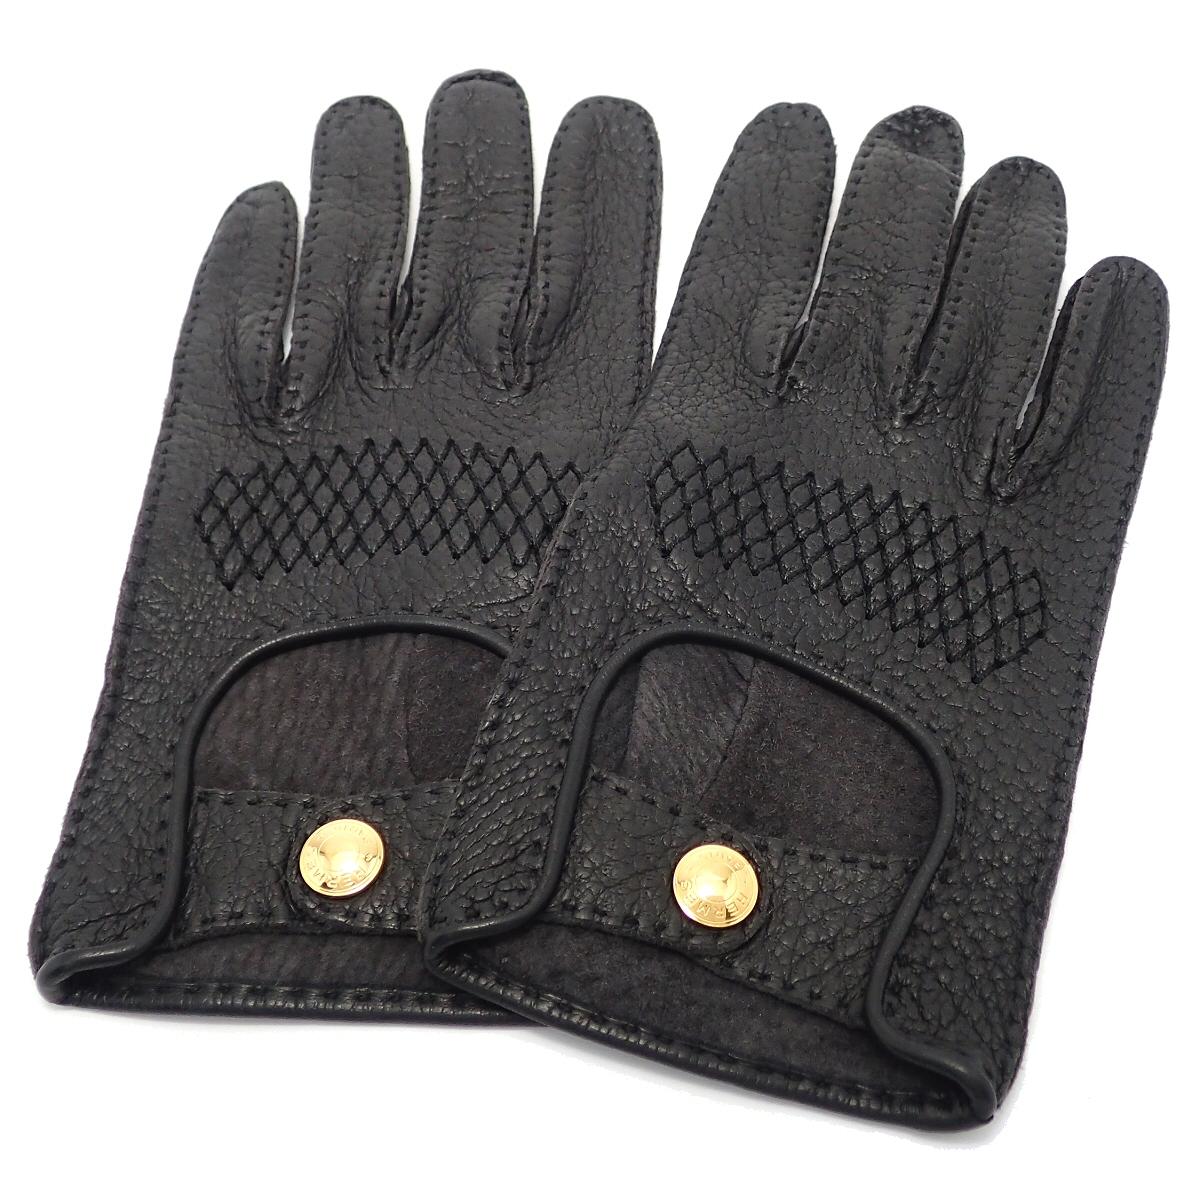 HERMES エルメス セリエ レザーグローブ 手袋 黒 レザー ゴールド金具 【中古】【k】【Blumin 市場店】